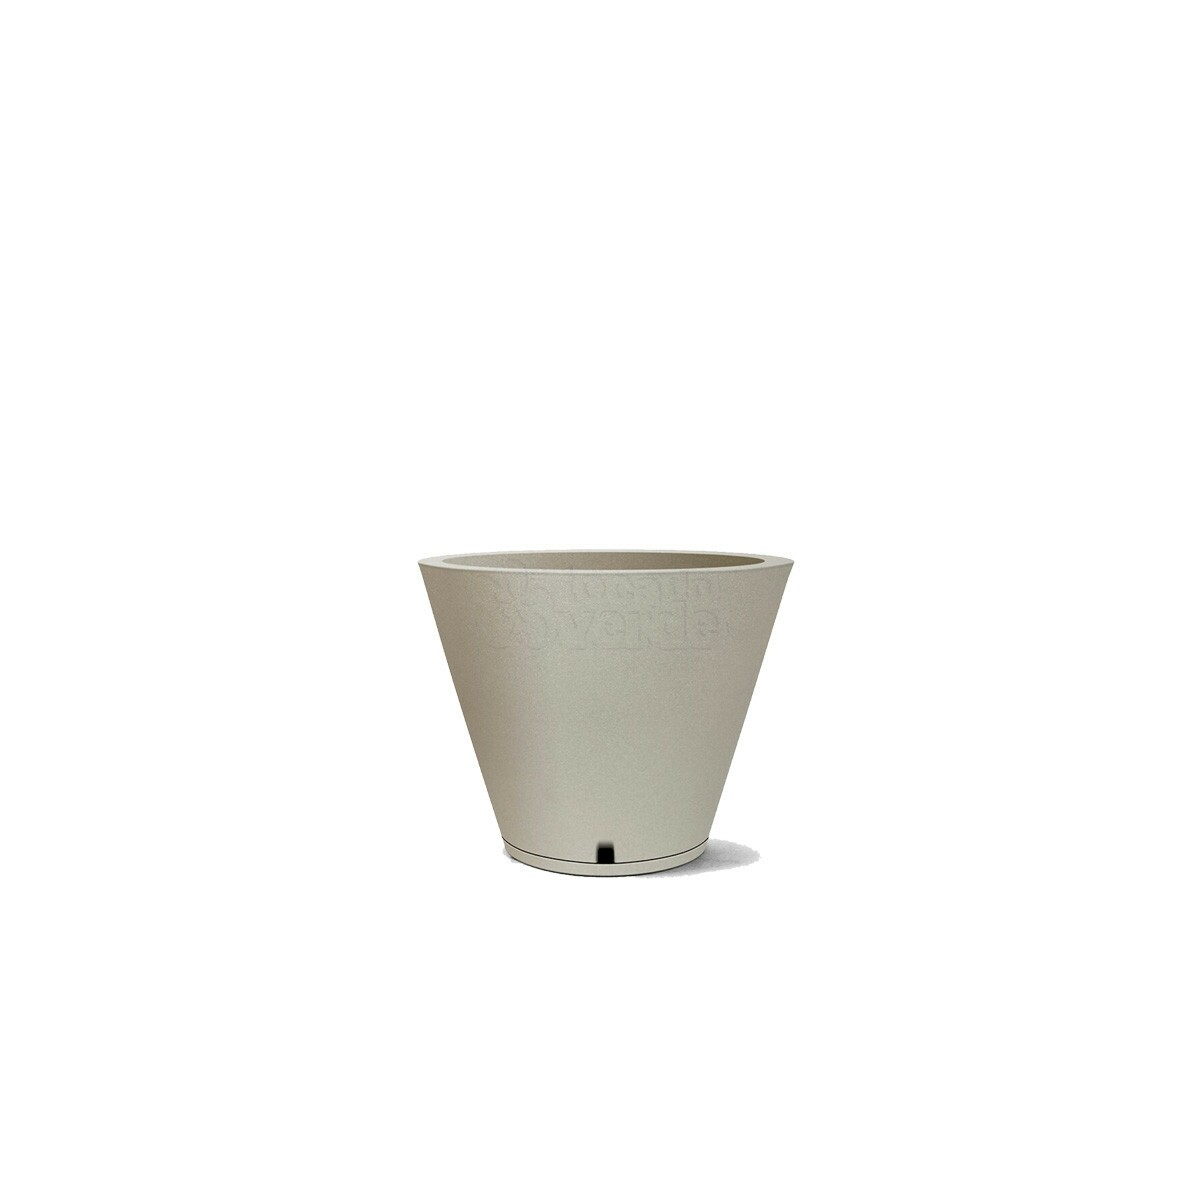 Vaso Petra N30 - Com prato embutido - 20 L - Cor Cimento